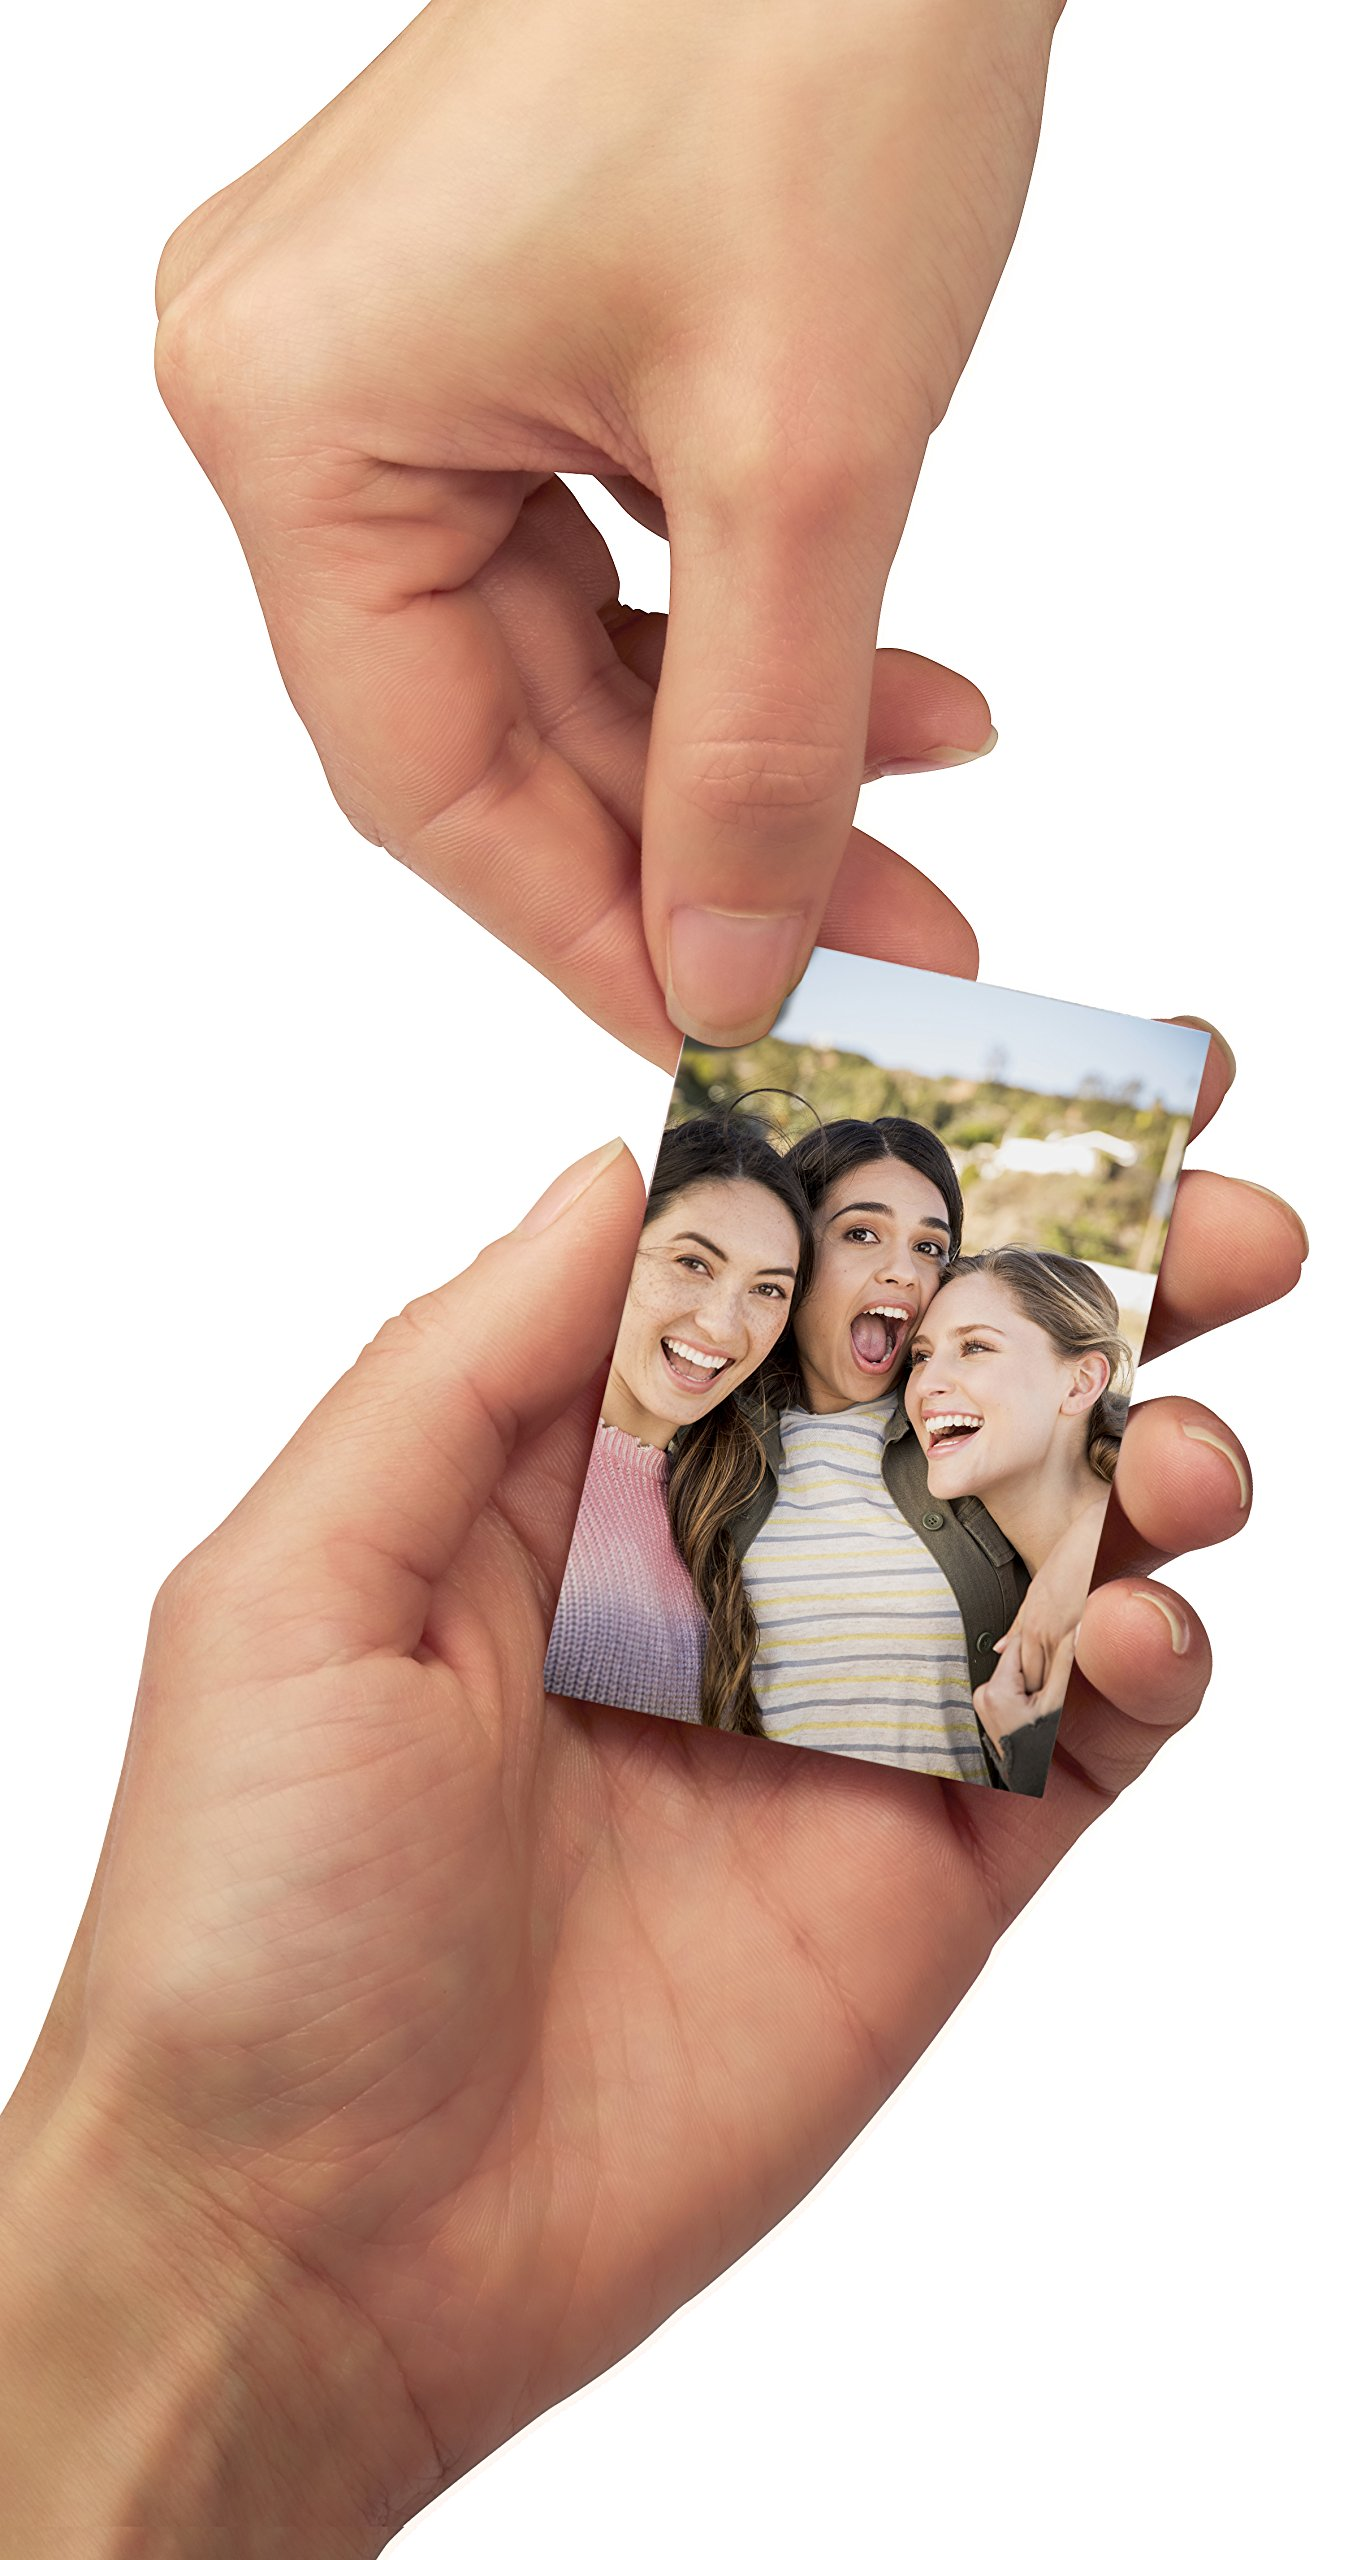 Canon IVY Mobile Mini Photo Printer through Bluetooth(R), Slate Gray by Canon (Image #10)